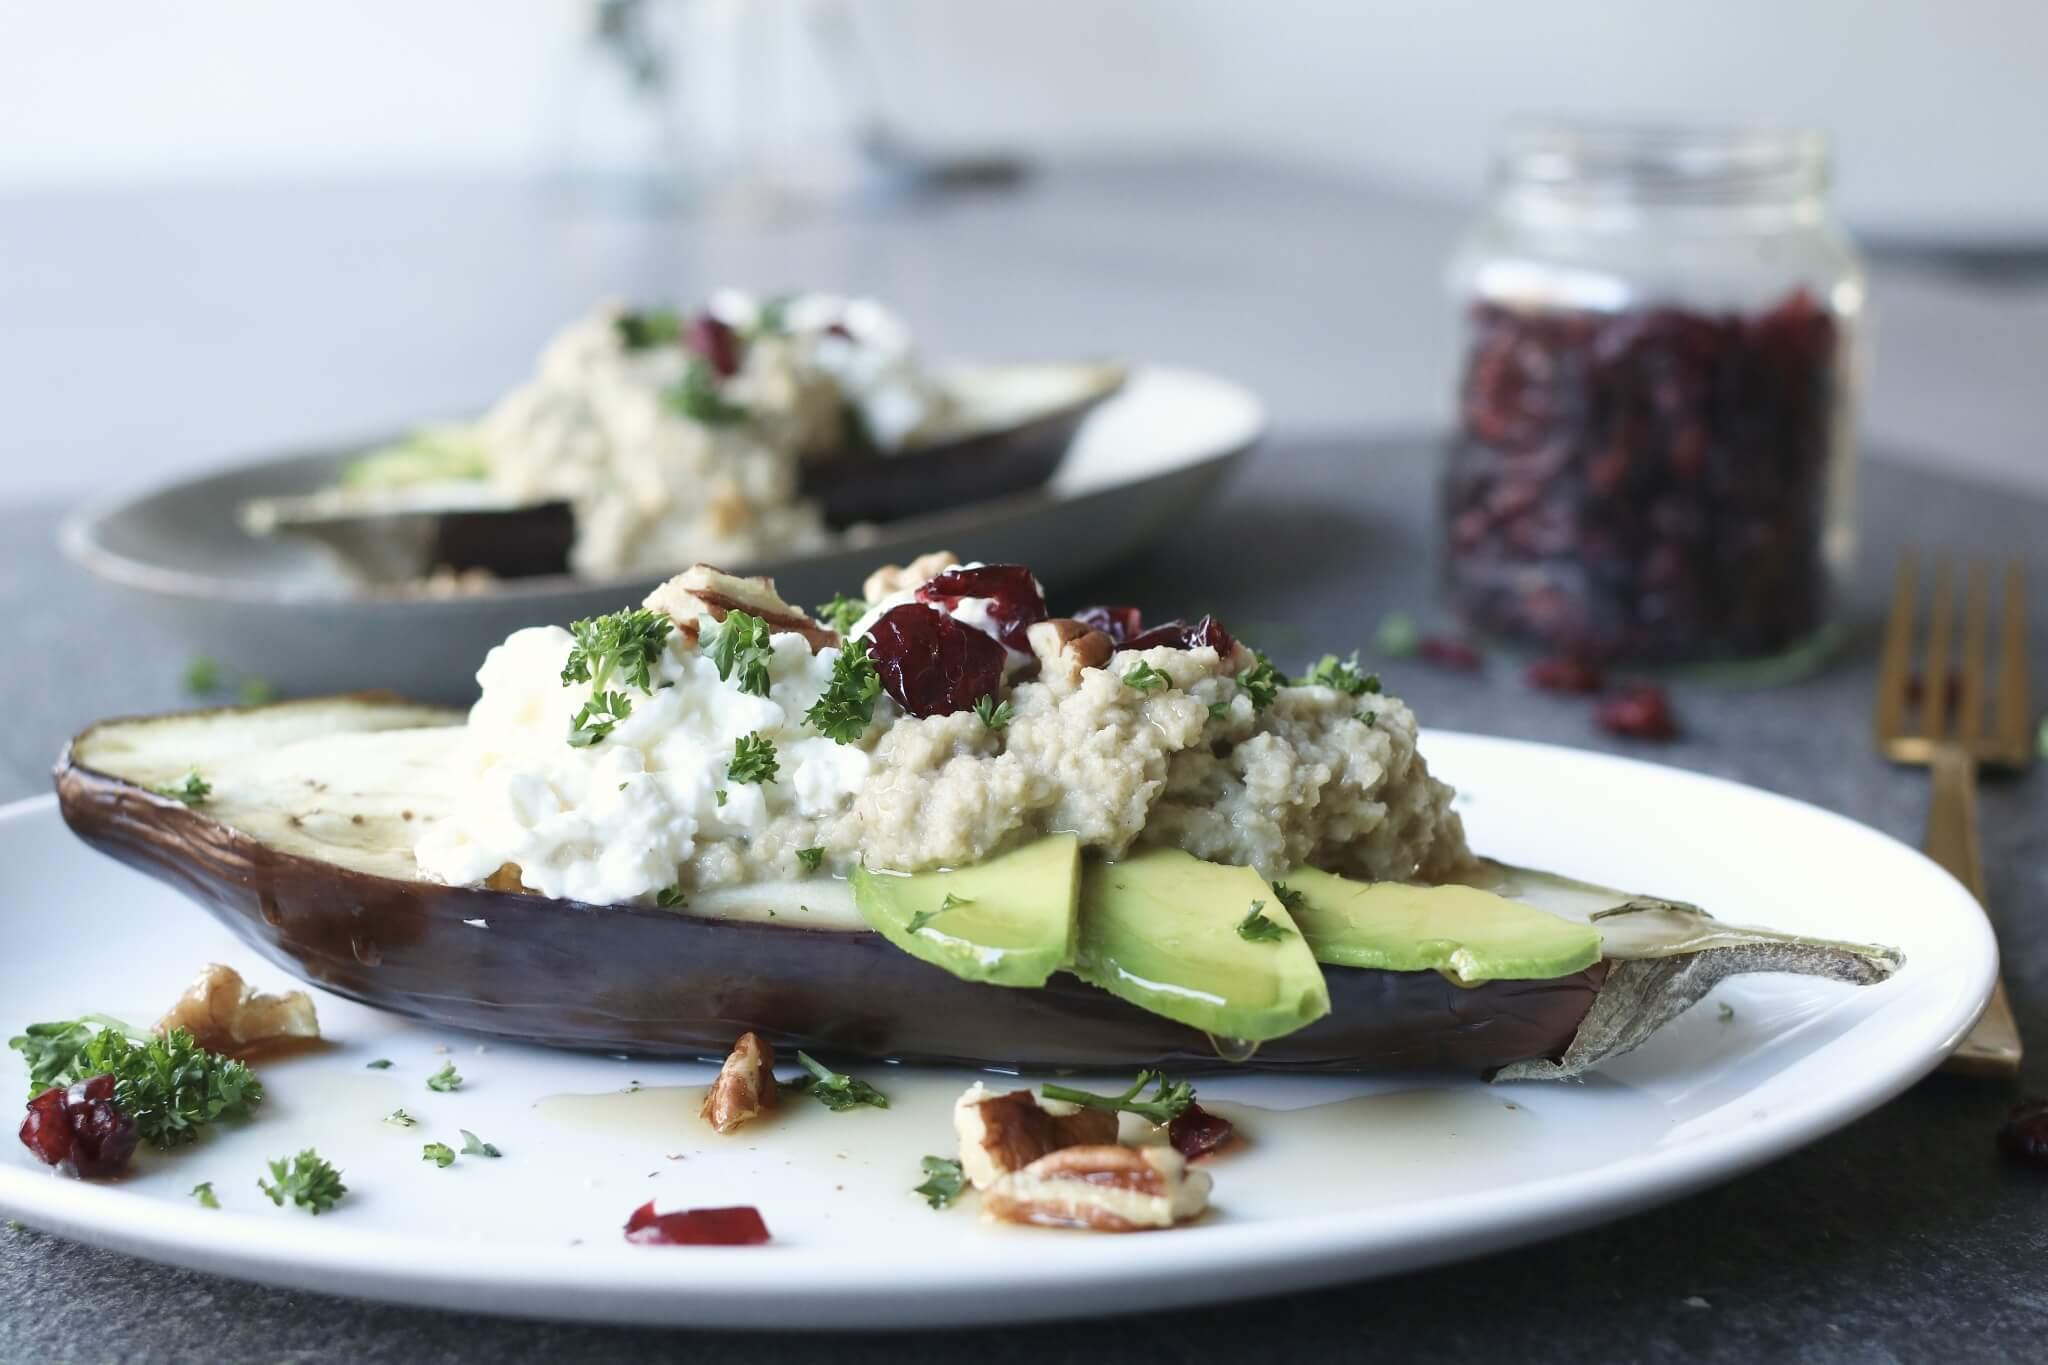 Gepofte aubergine met baba ganoush, Gezond avondeten, Vegetarisch avondeten, Glutenvrije avondmaaltijden, Beaufood recepten, Huttenkase recepten